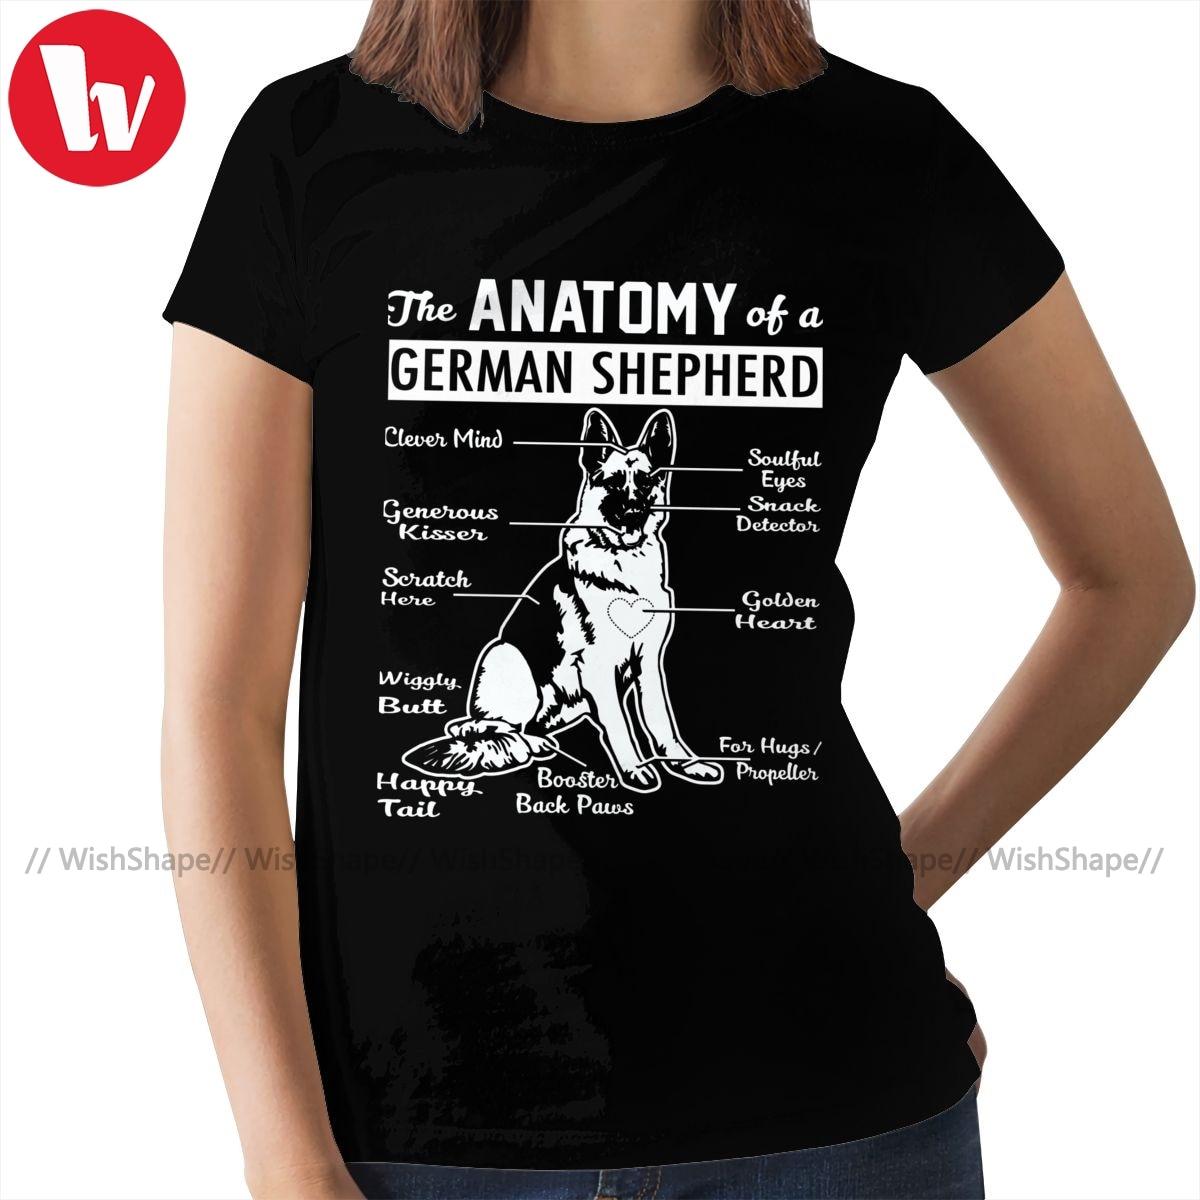 Camiseta de Pastor Alemán, camiseta de anatomía, camiseta de moda urbana de manga corta para mujer, Camiseta de cuello redondo para mujer